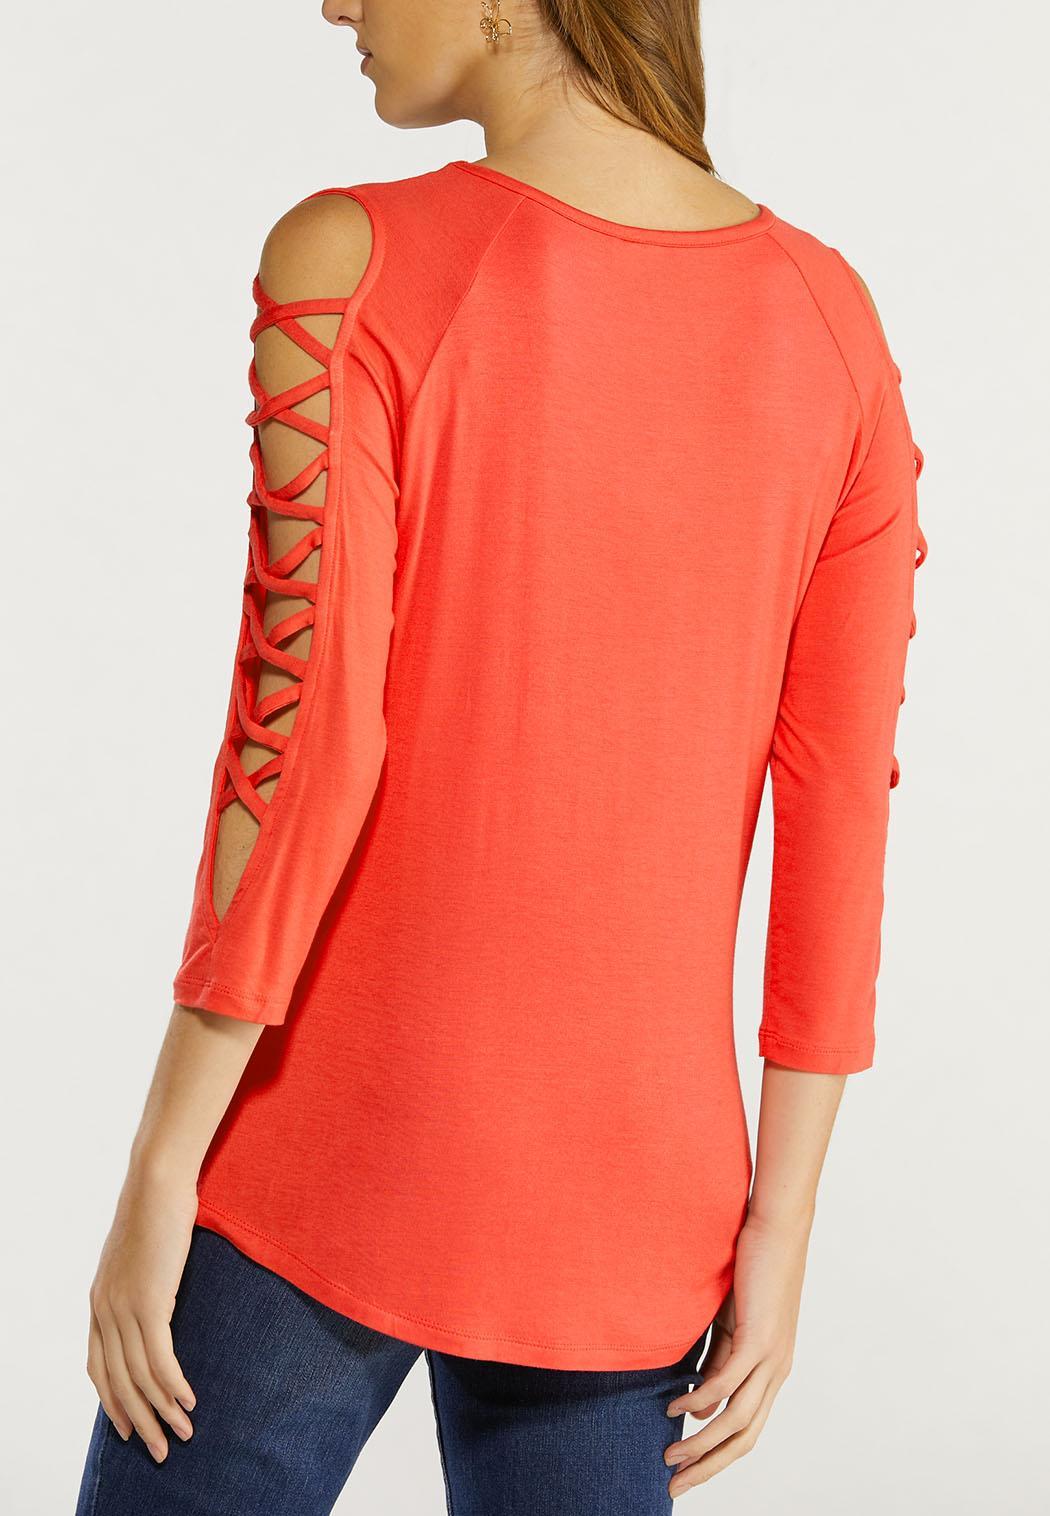 Plus Size Cutout Criss Cross Sleeve Top (Item #44493721)